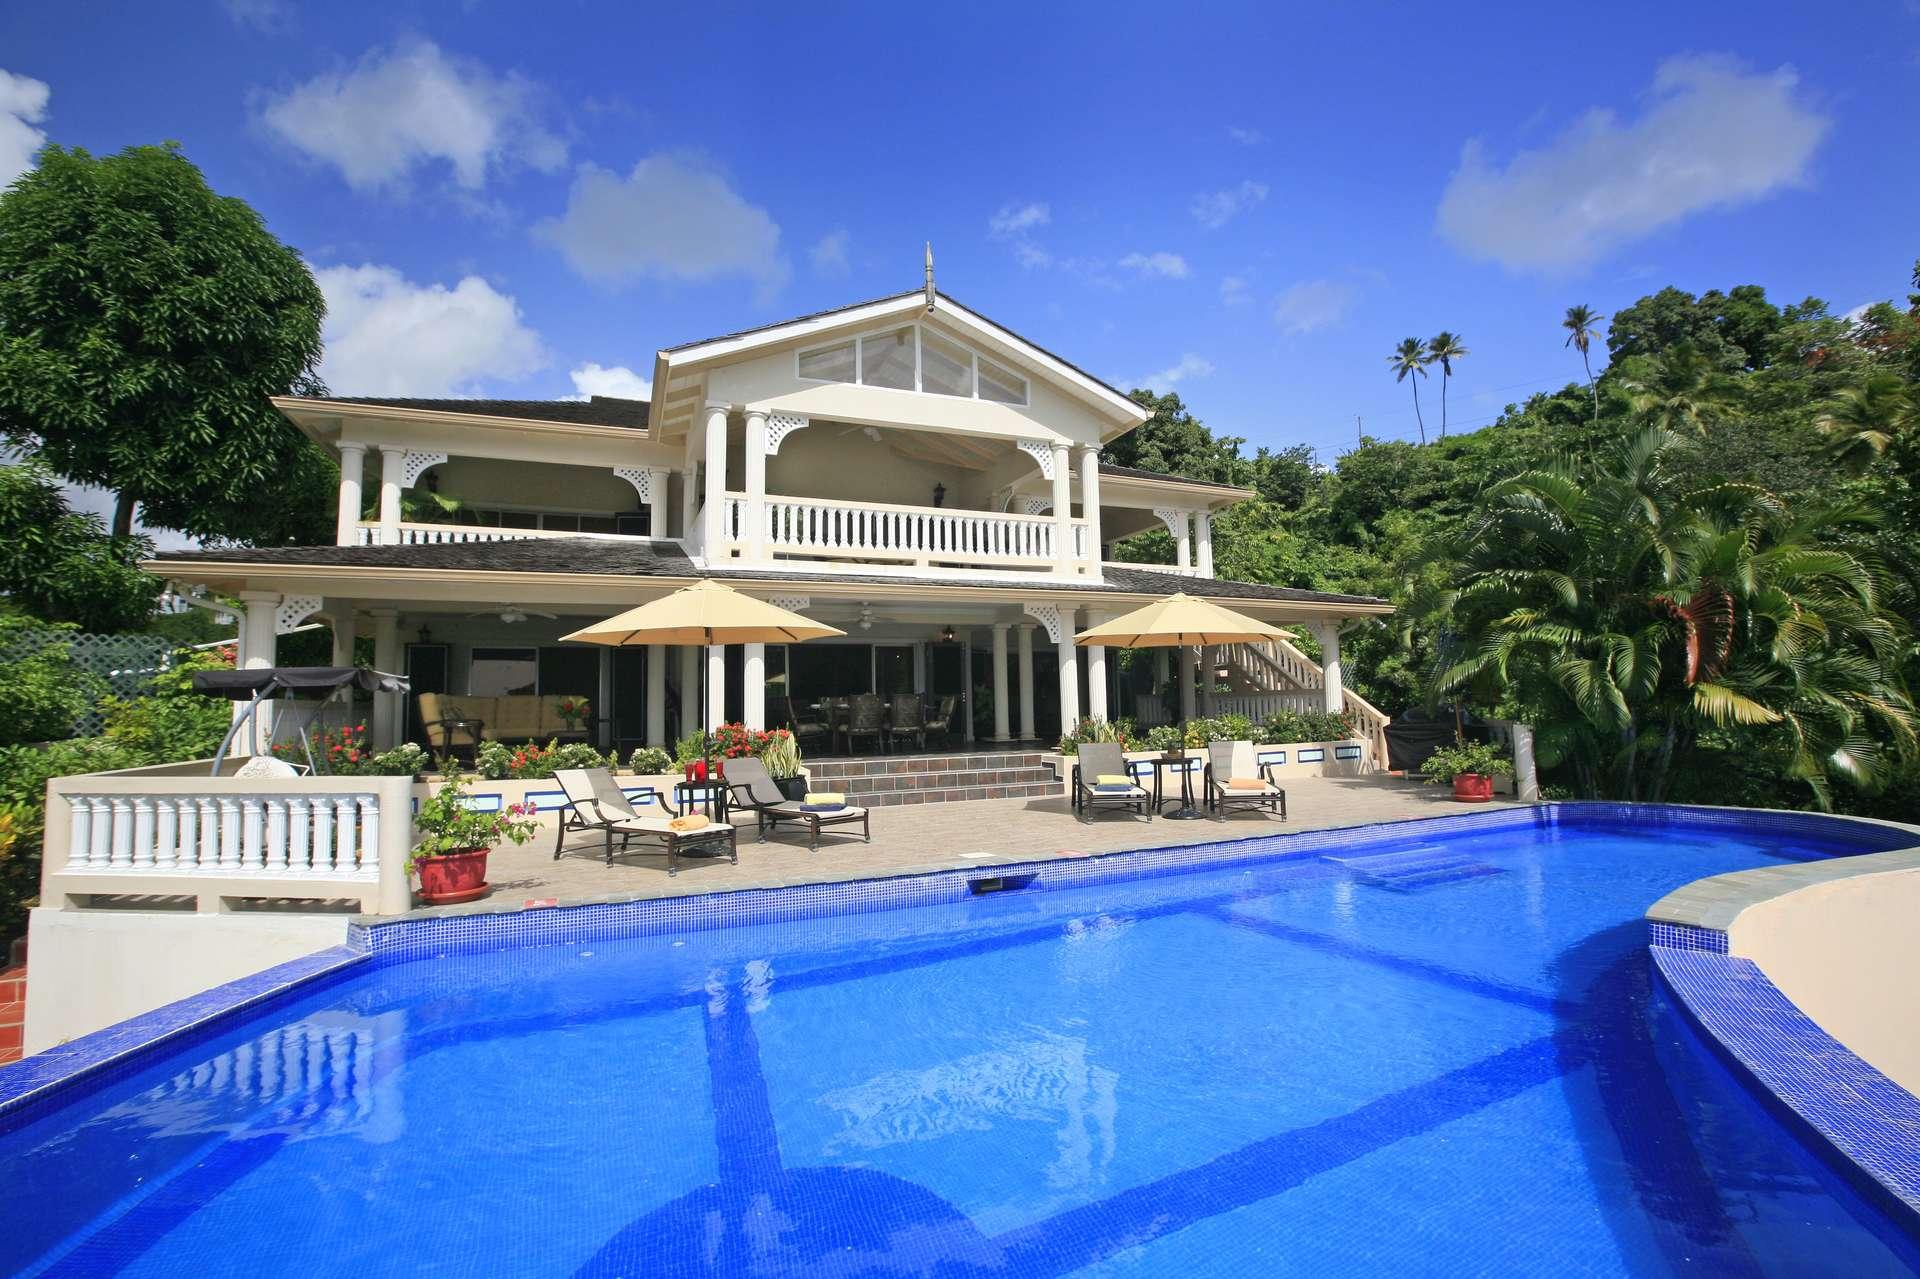 Luxury villa rentals caribbean - St lucia - Marigot bay - Ashiana Villa - Image 1/13